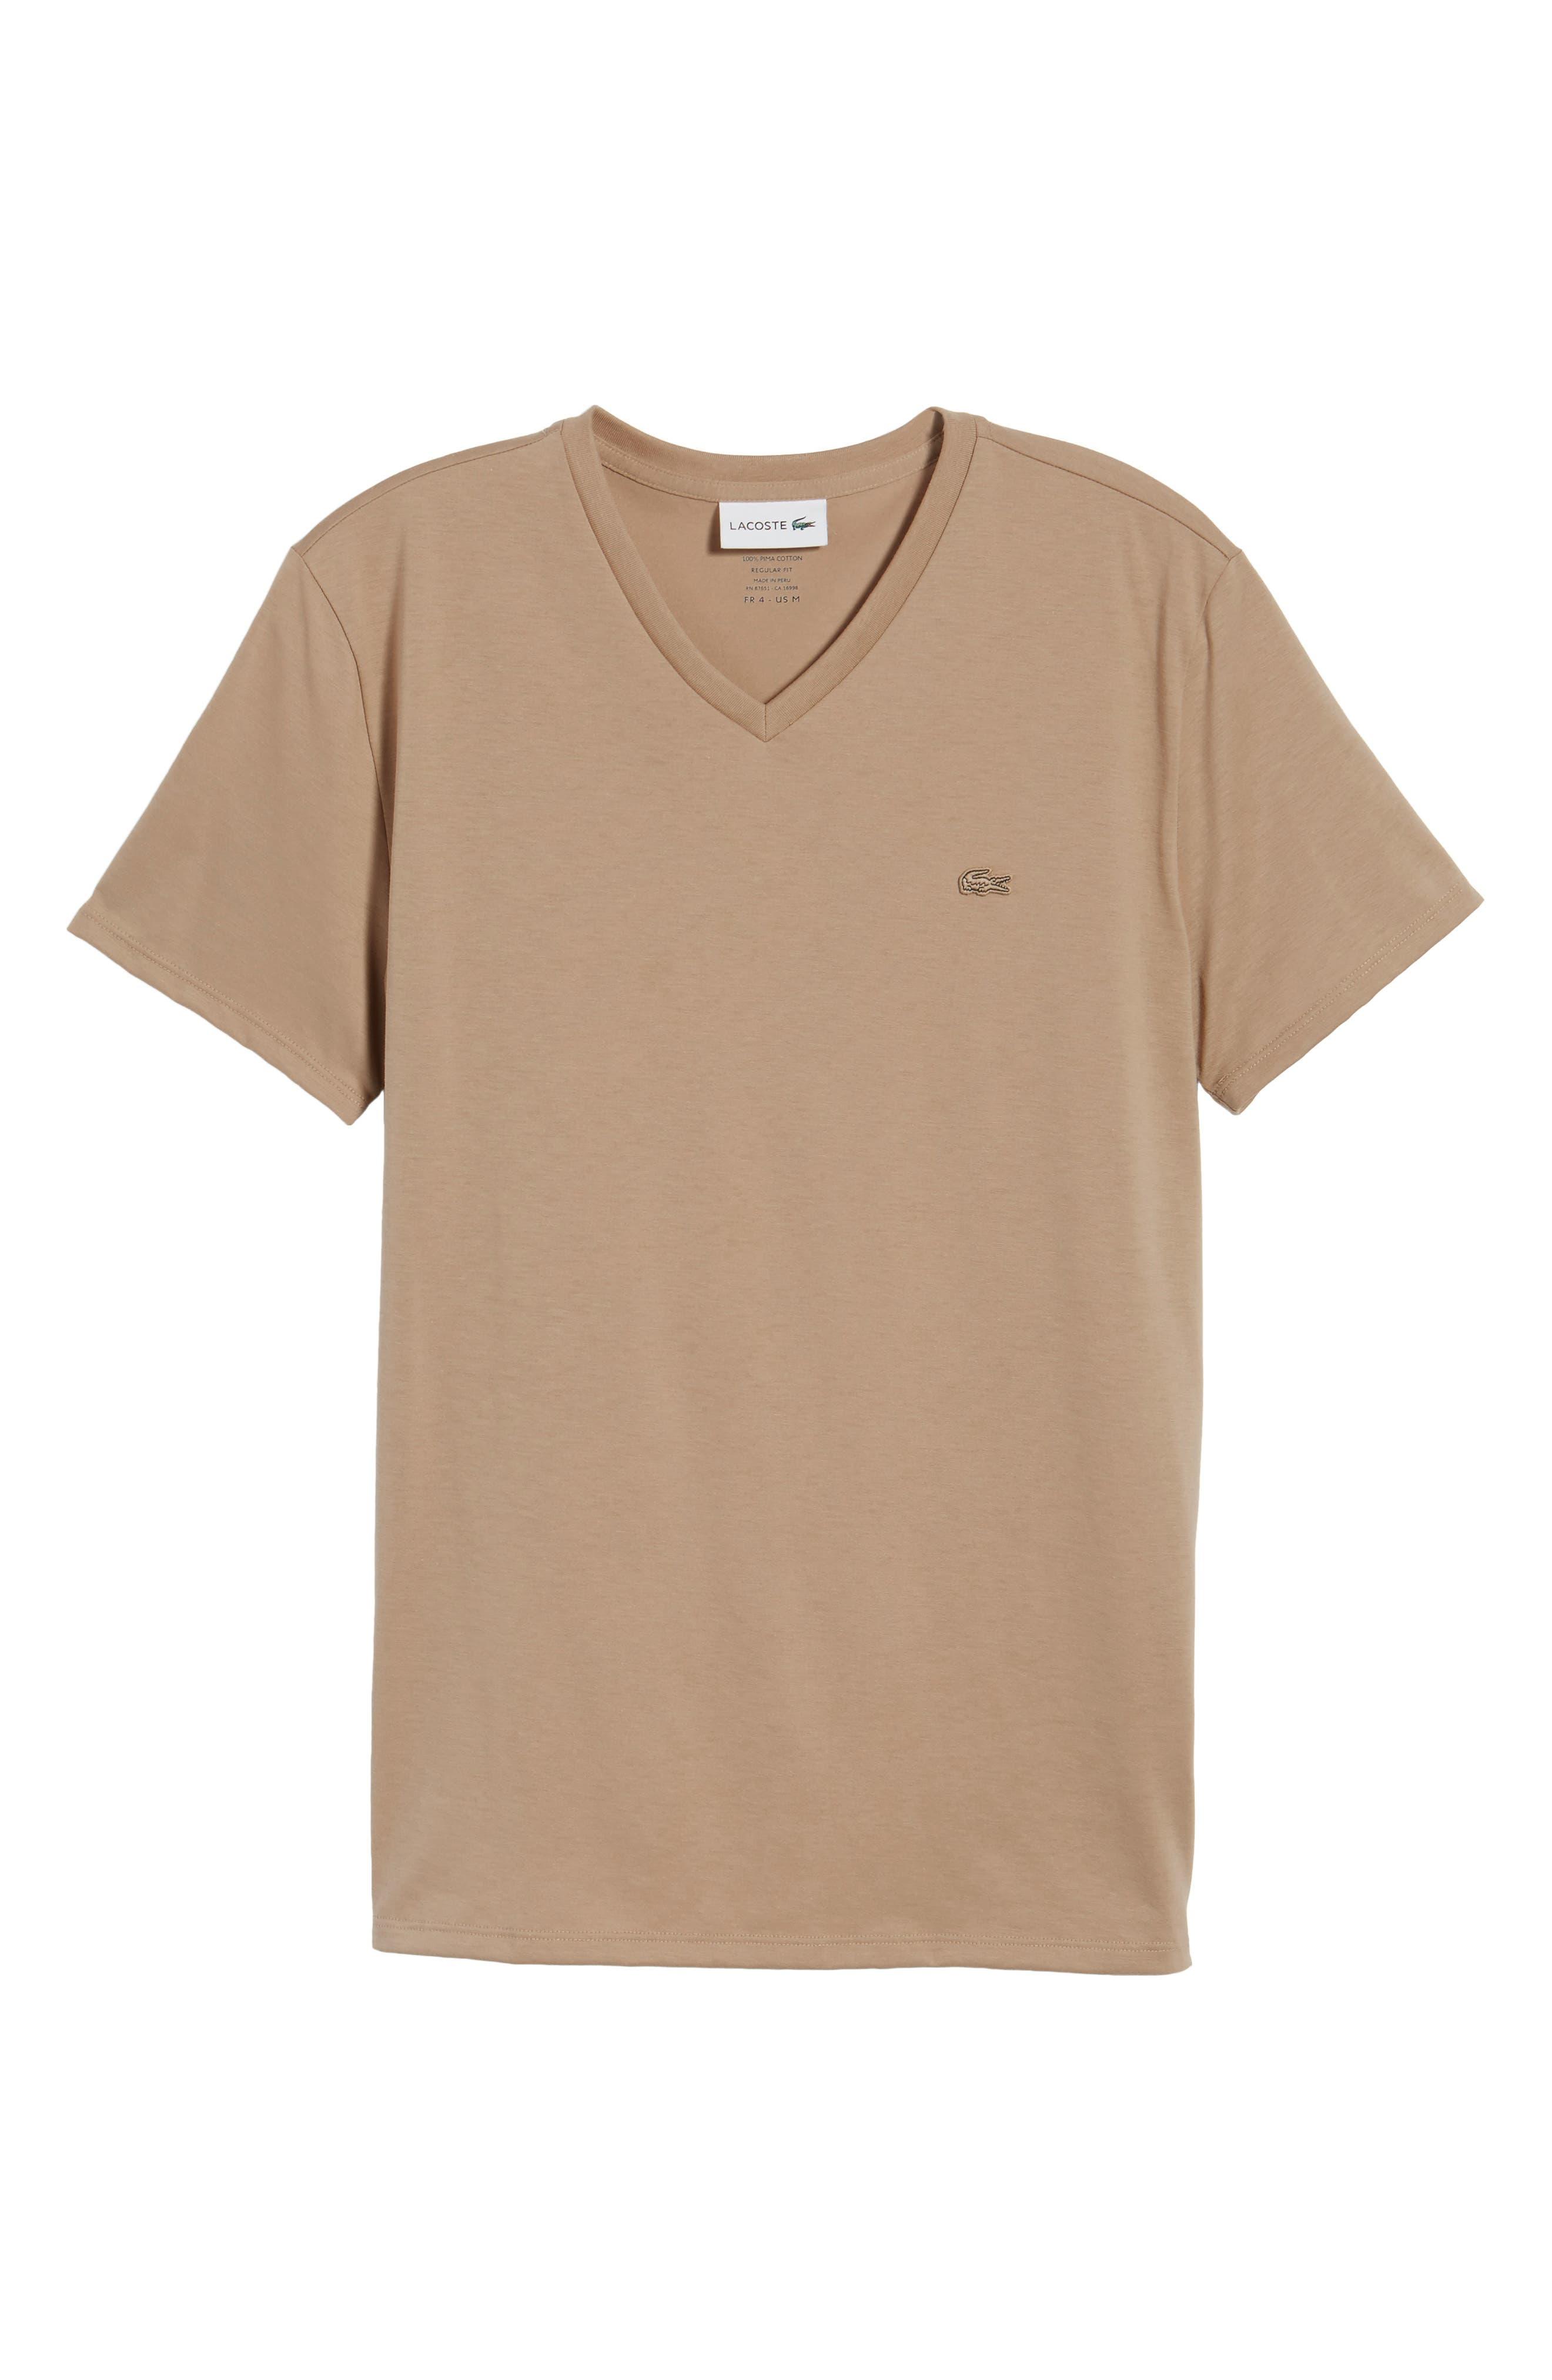 Pima Cotton T-Shirt,                             Alternate thumbnail 6, color,                             KRAFT BEIGE